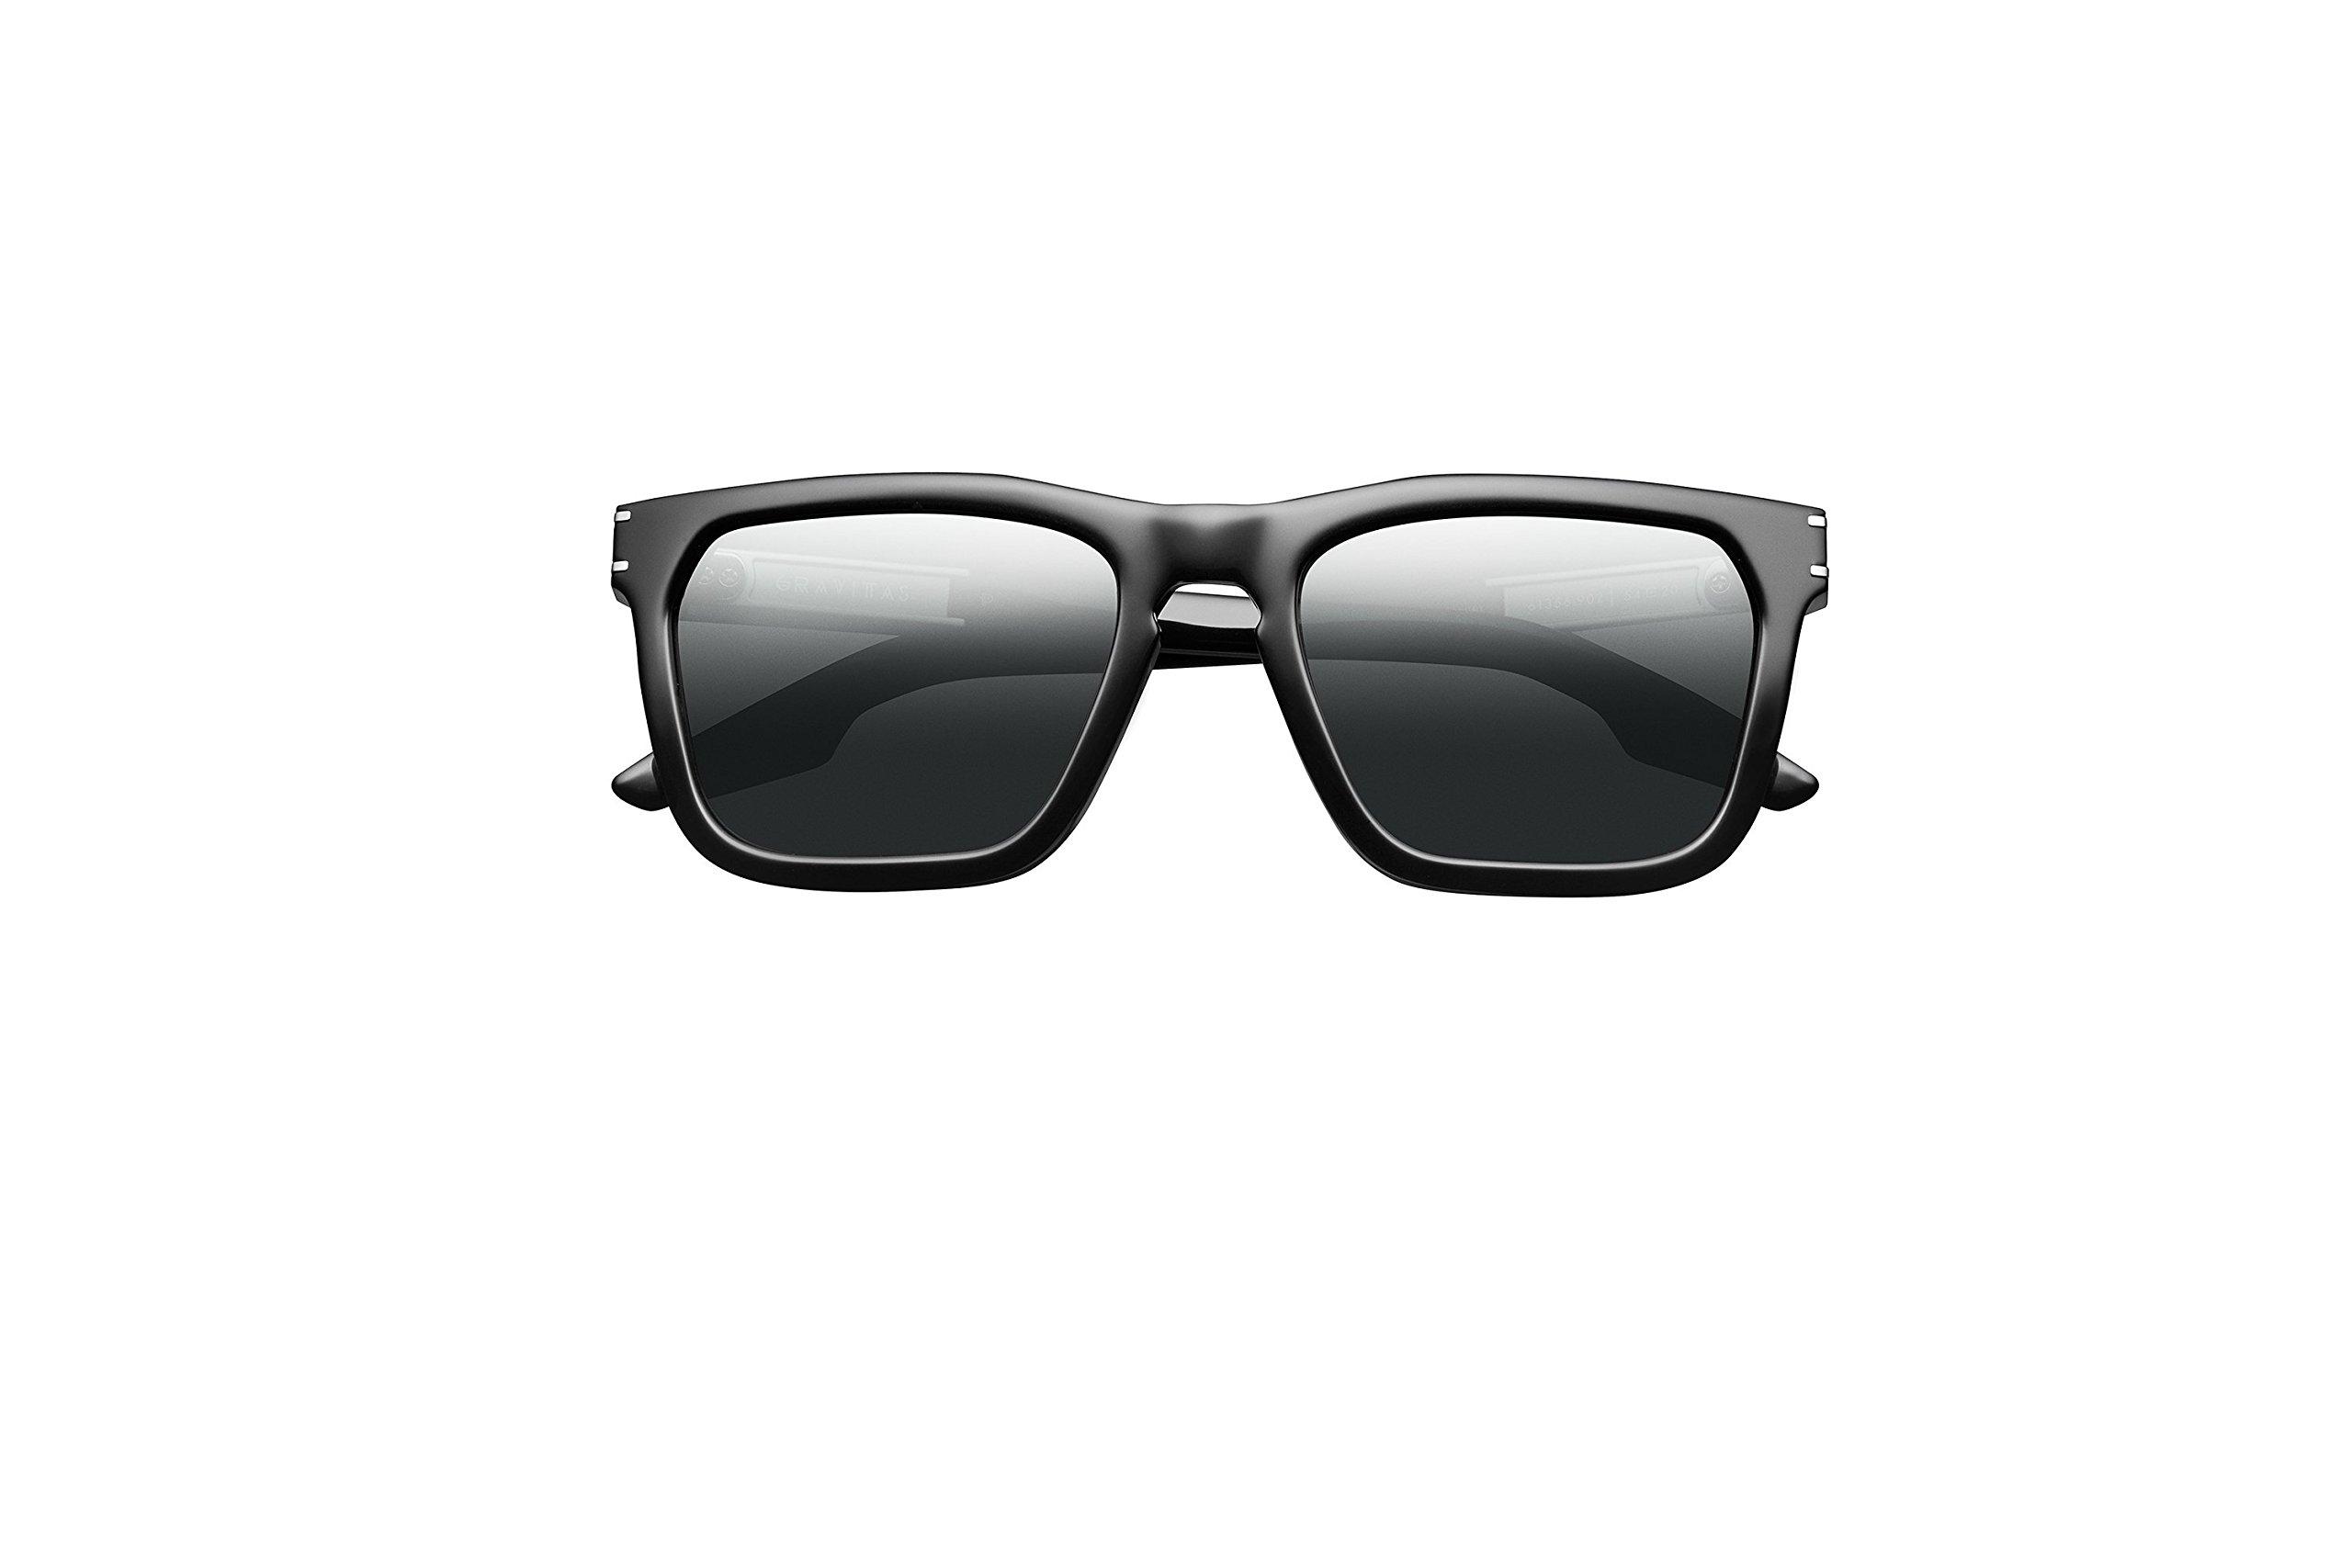 IVI Gravitas Sunglasses (Polished Black - Brushed Silver/Grey Polarized AR)